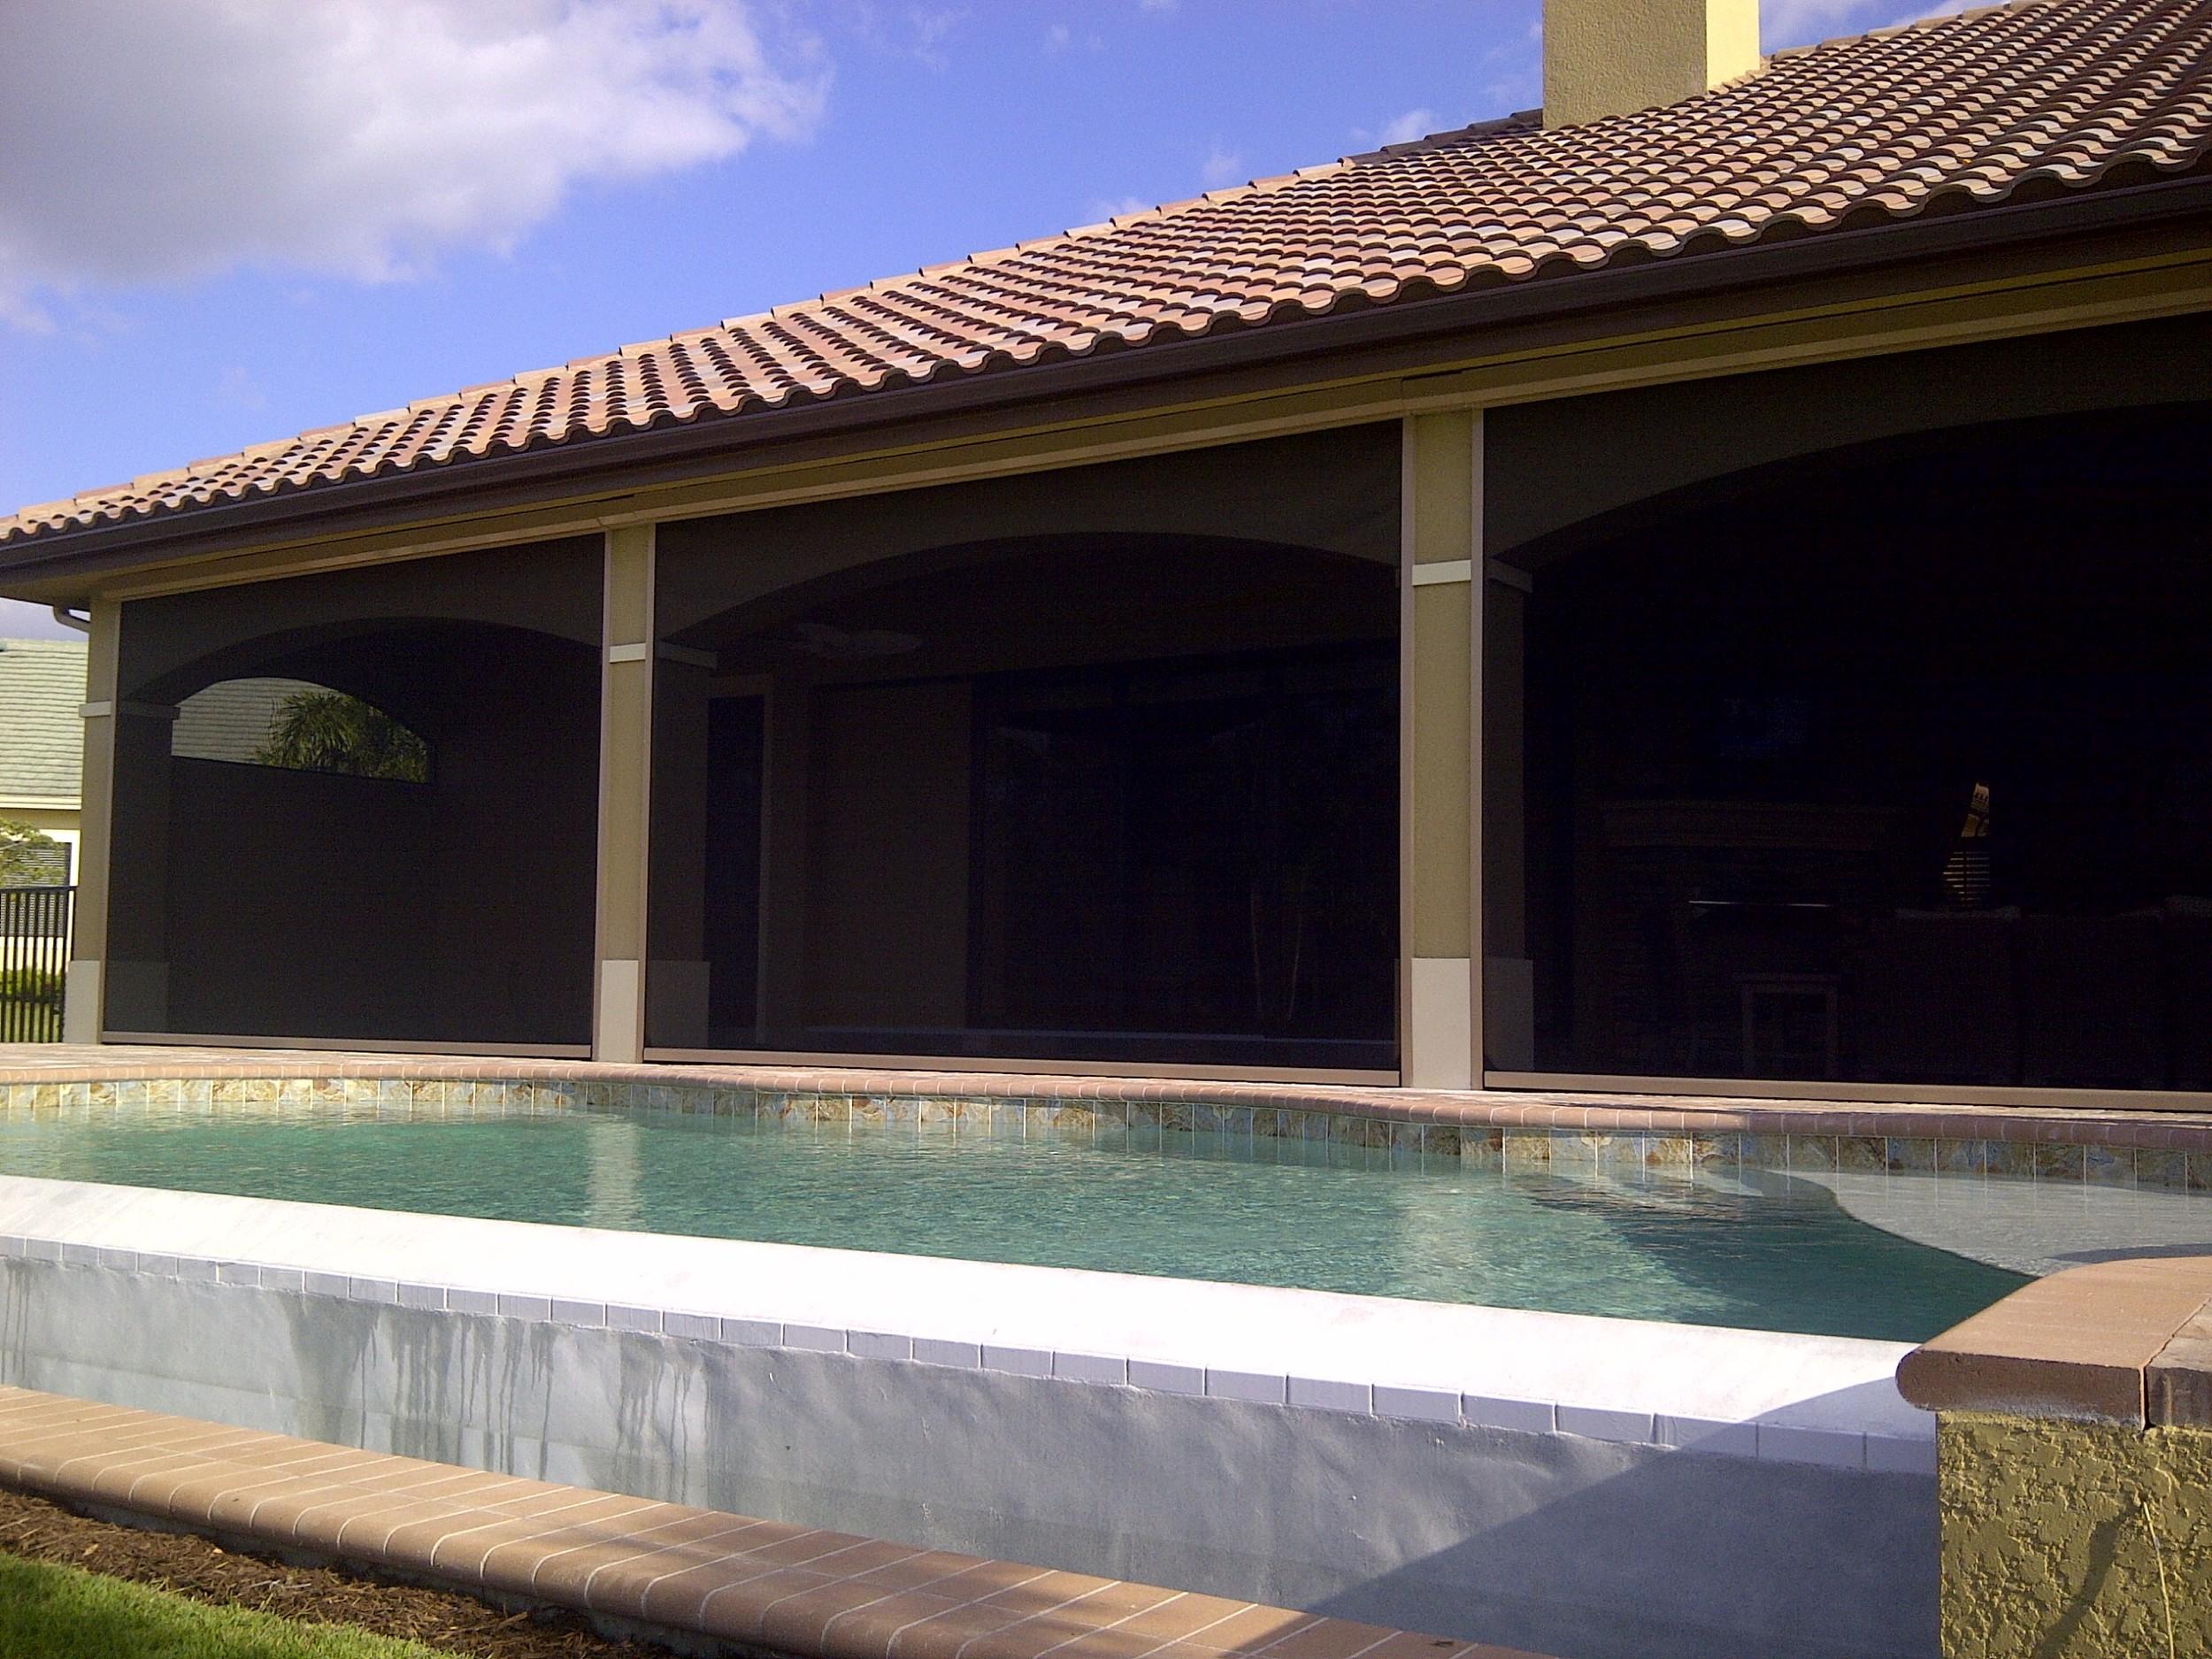 219 Pool Lanai Covered Black Vista Screens